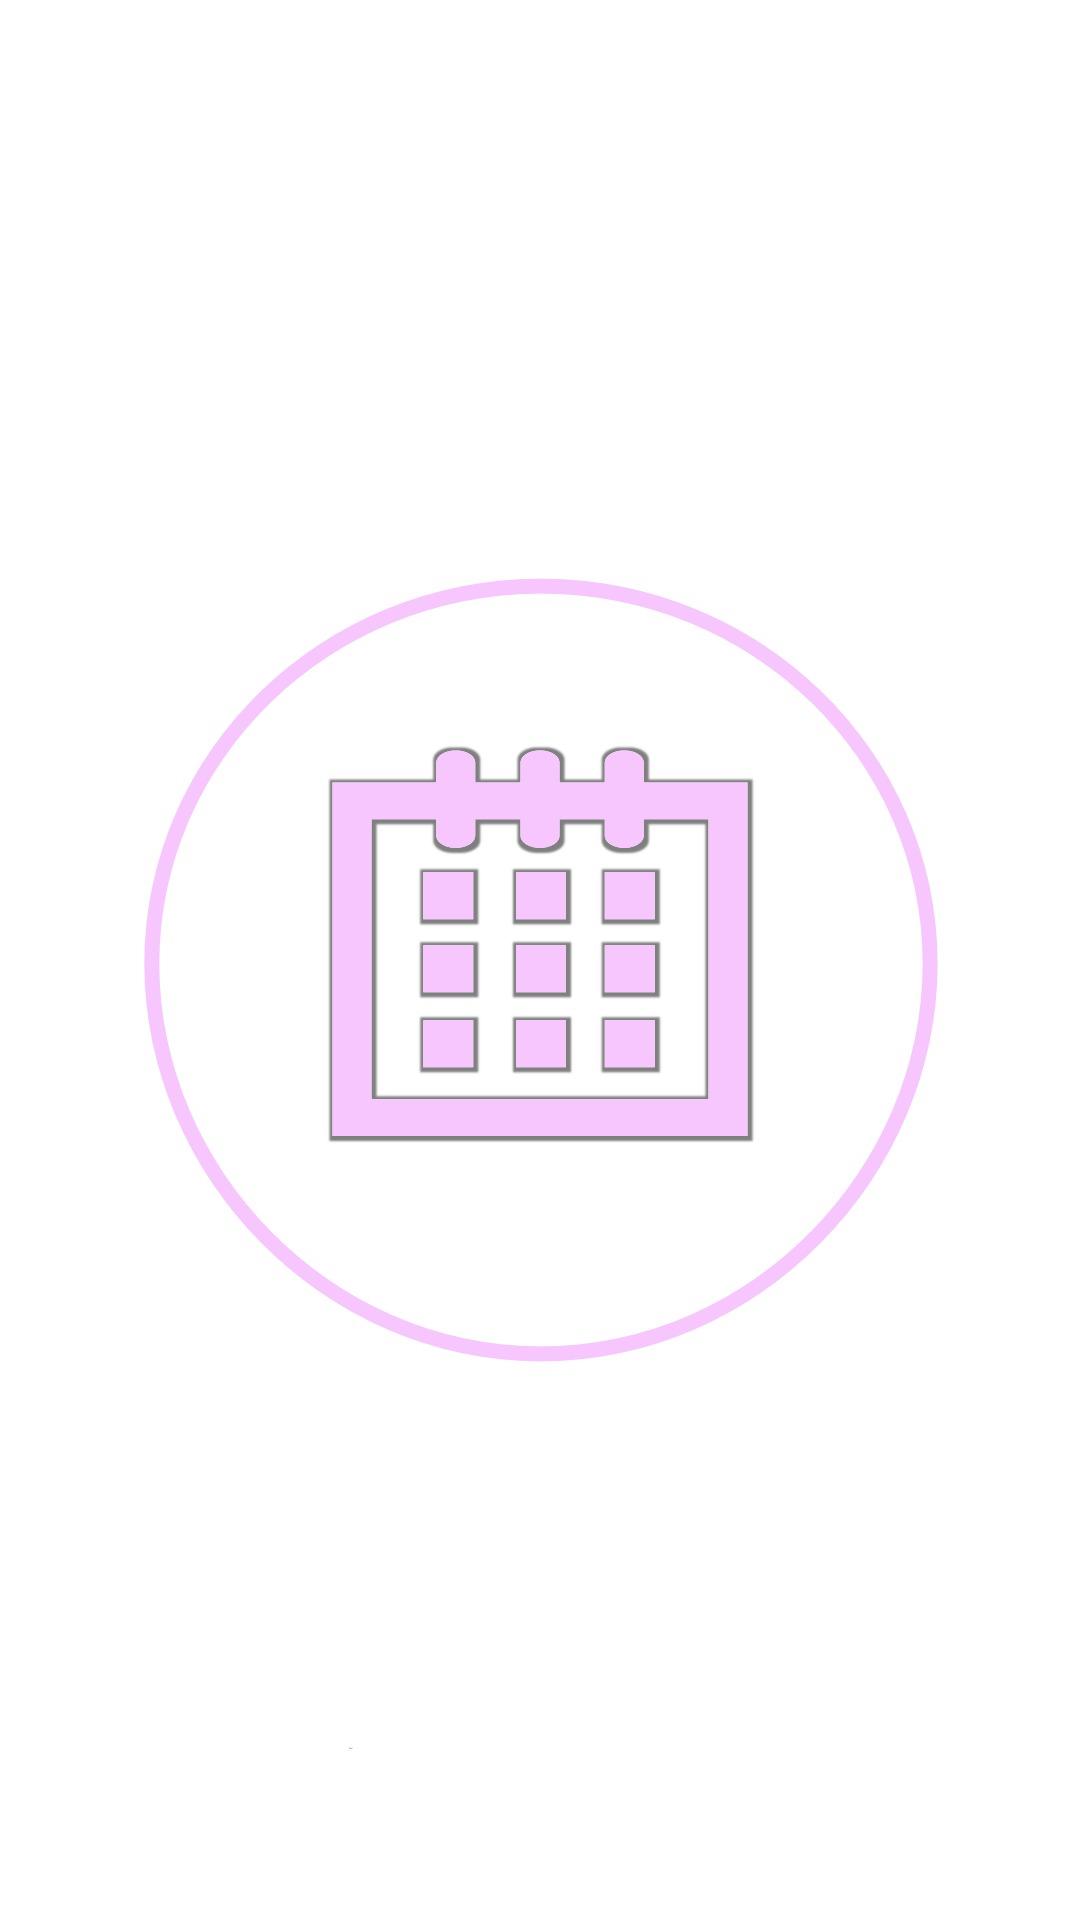 Instagram-cover-calendar-pinkwhite-lotnotes.com.jpg